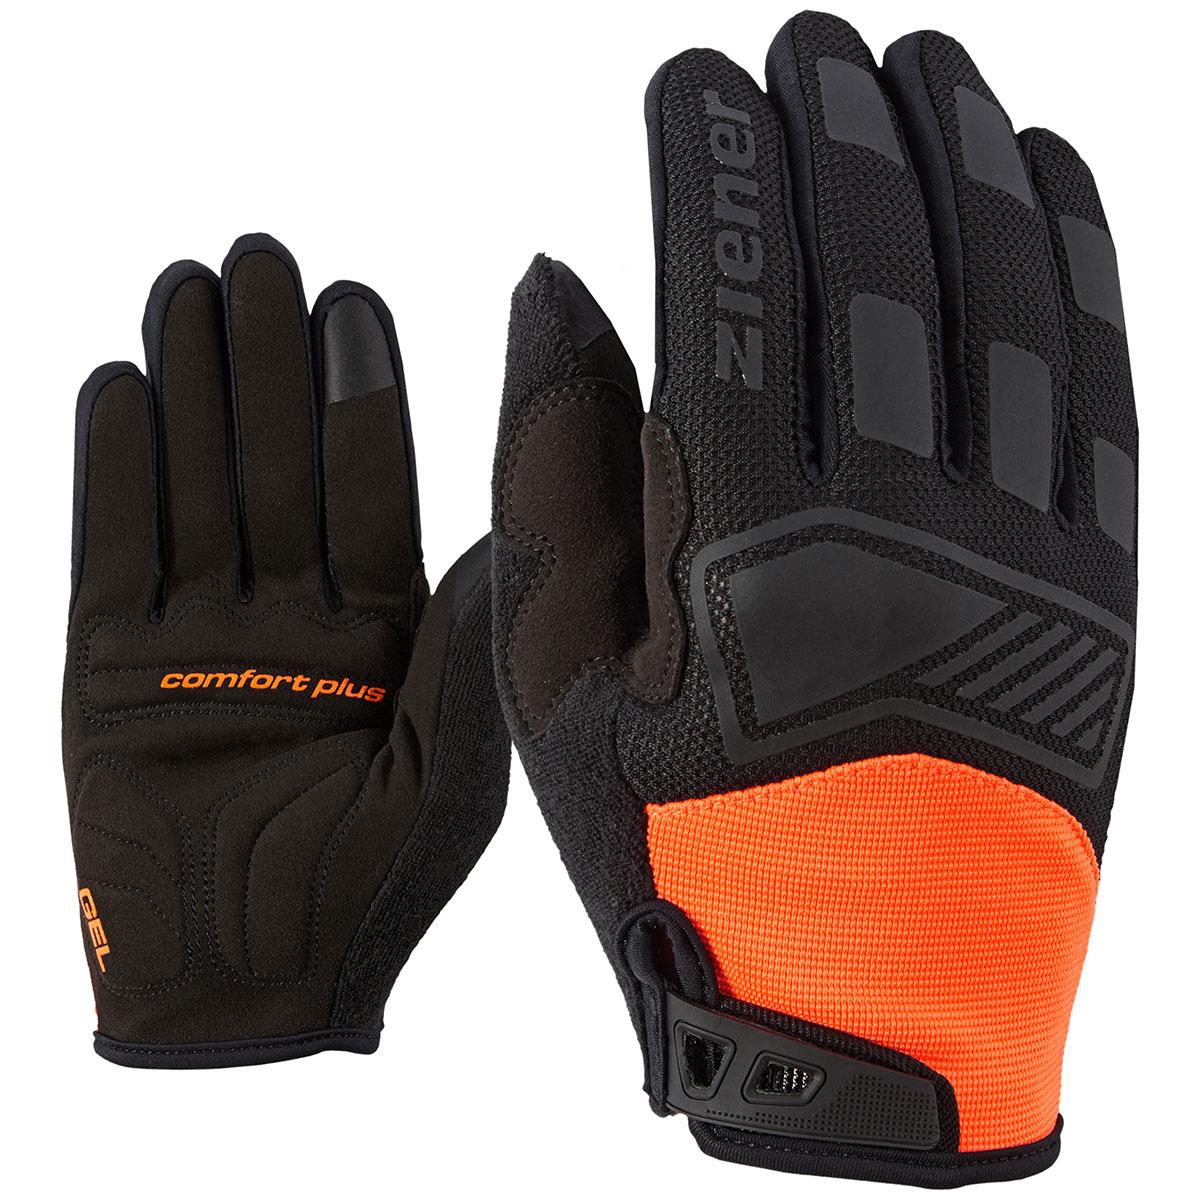 camet touch long bike glove ziener gloves skiwear. Black Bedroom Furniture Sets. Home Design Ideas